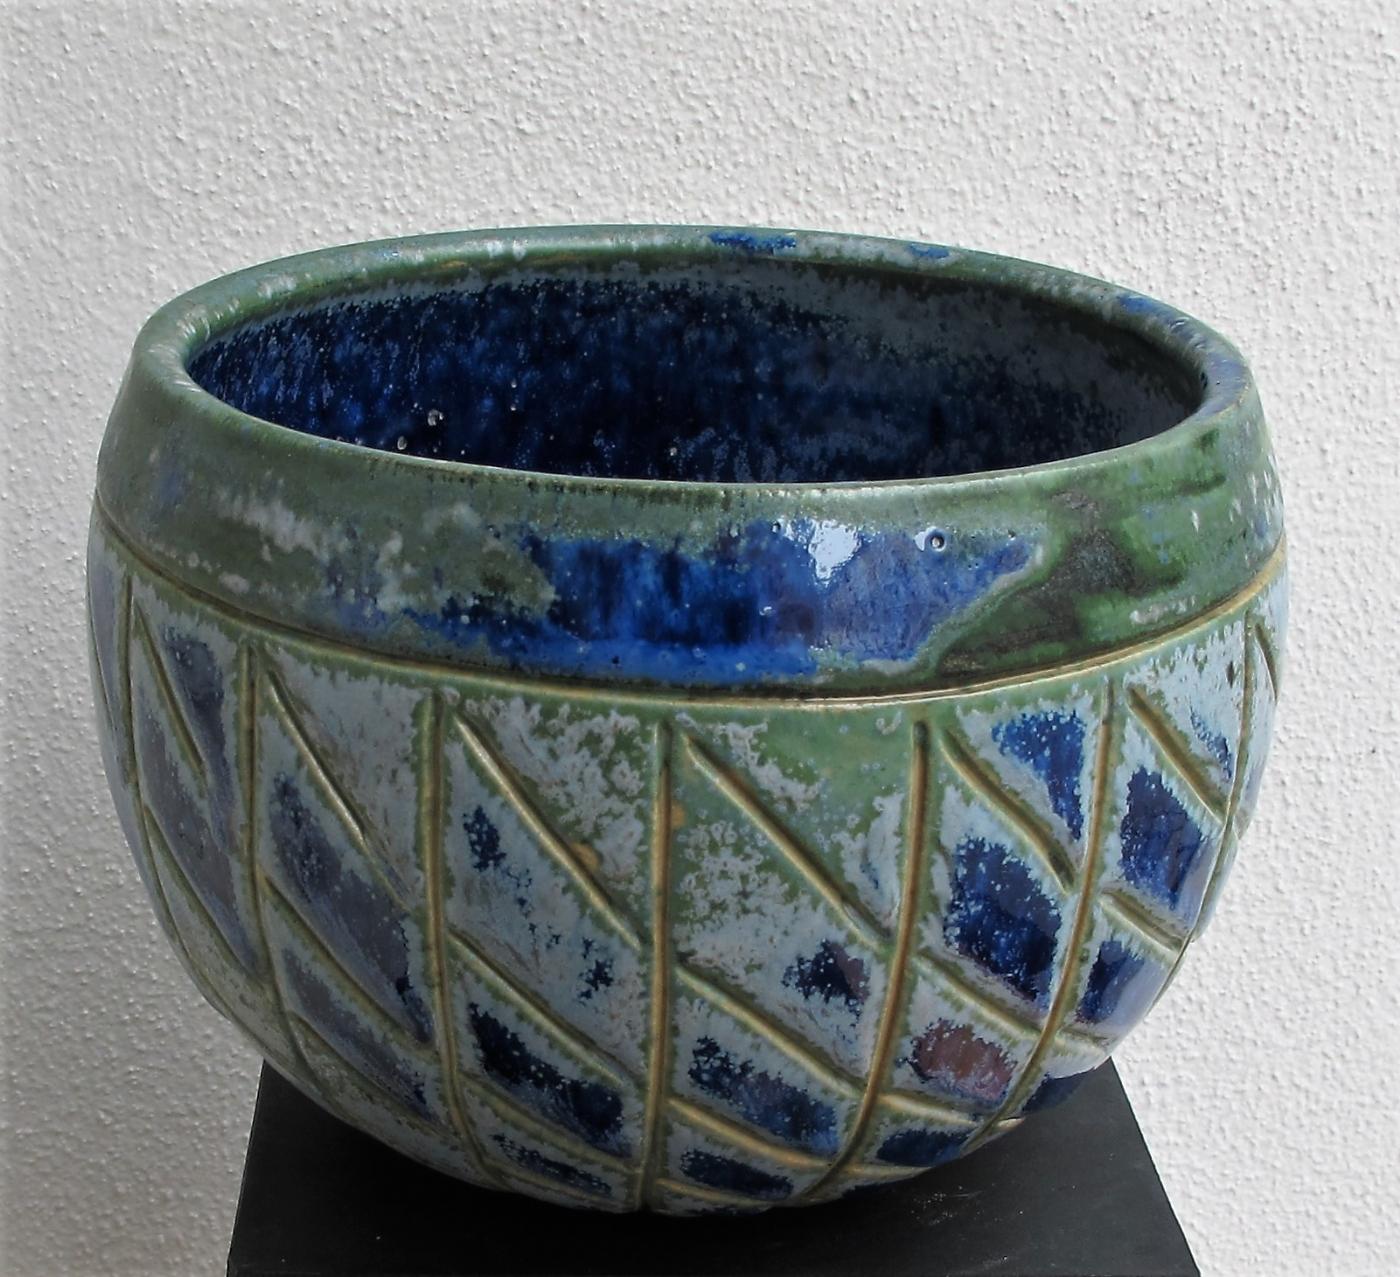 buttet krukke uden metal | Keramik